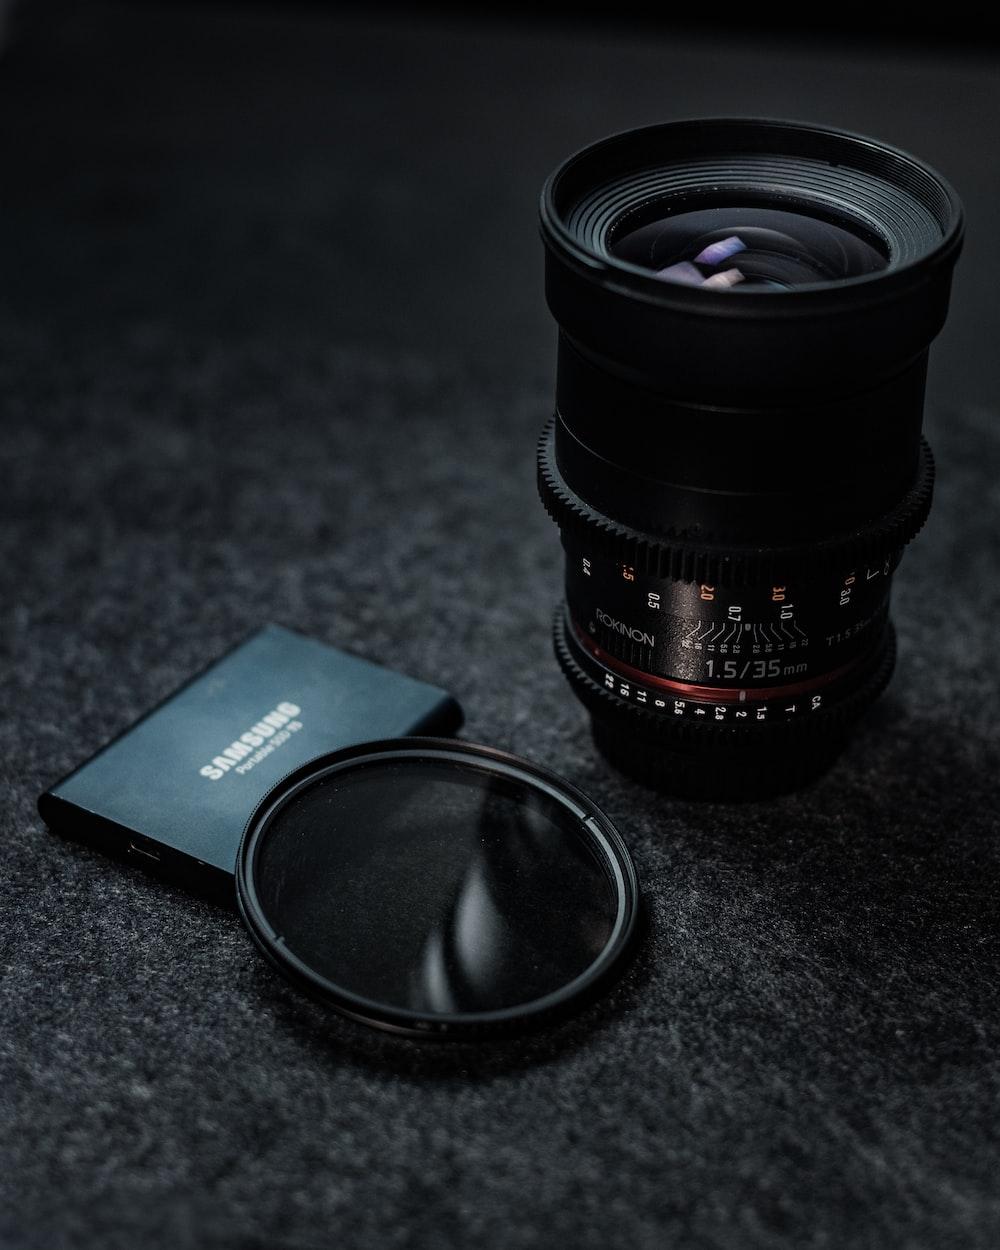 black camera lens beside black samsung galaxys 7 edge